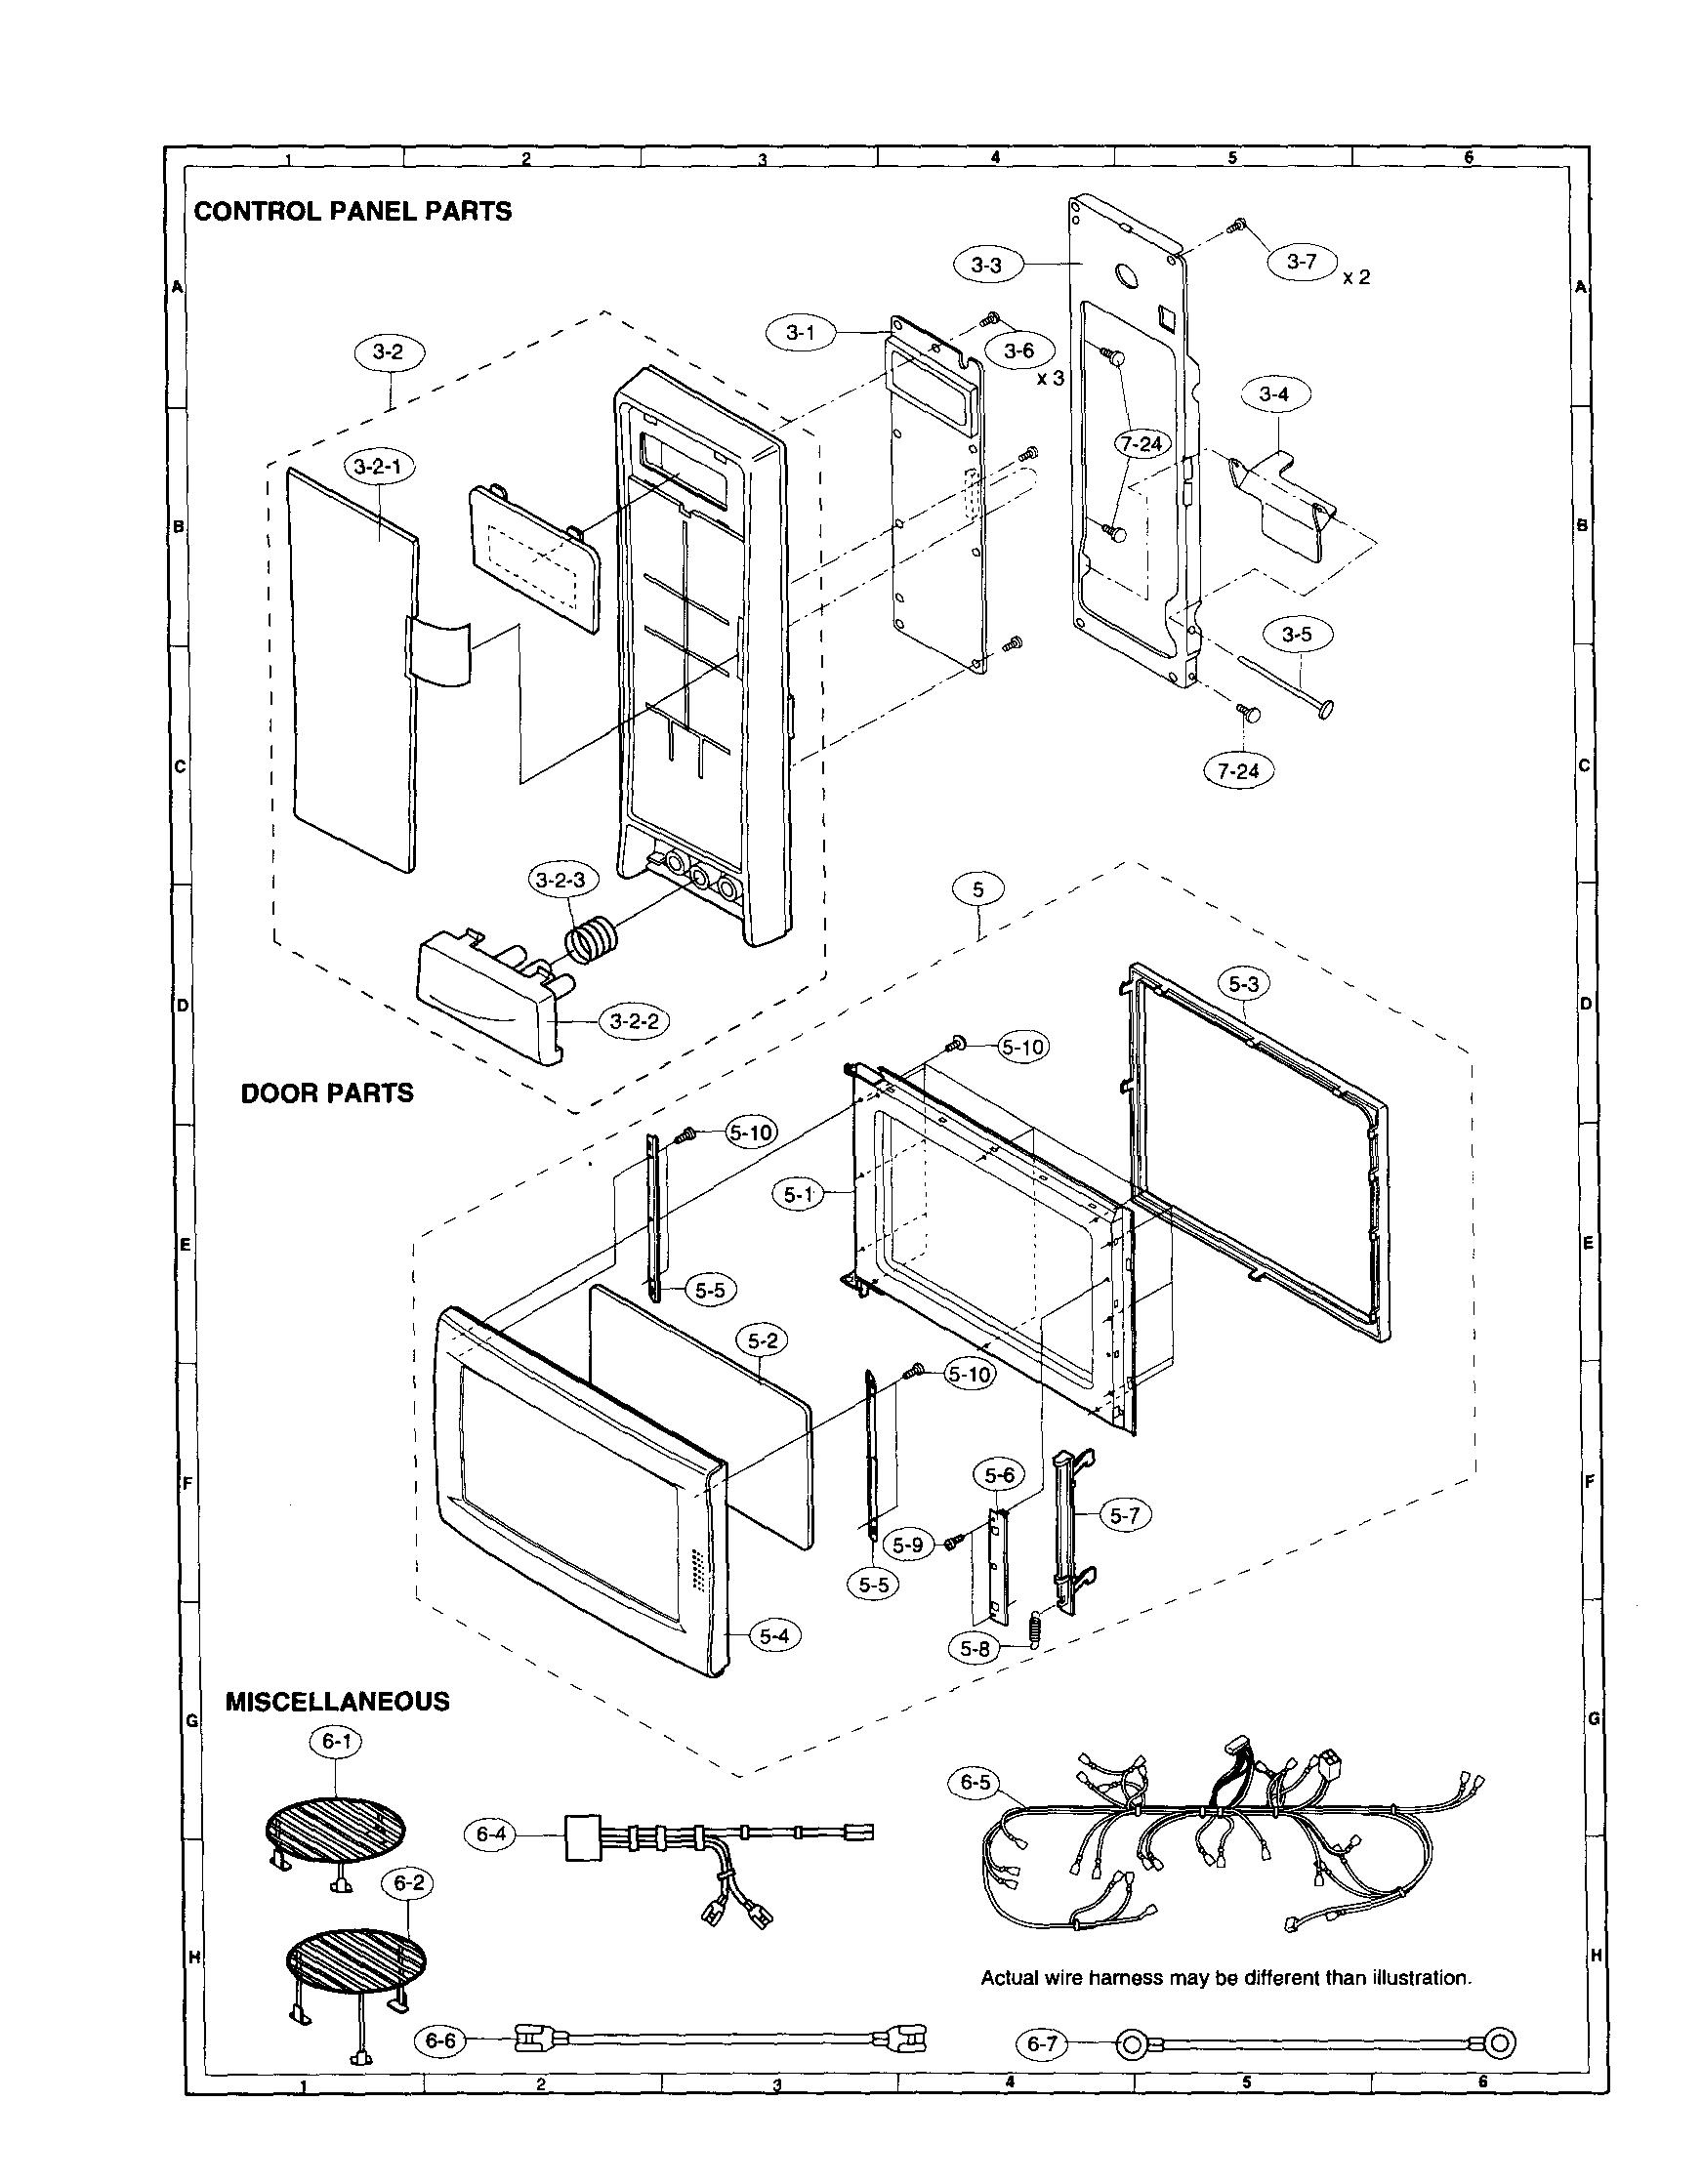 Sharp microwave spare parts motorviewco p0103084 00002 sharp microwave spare parts p9100281 00003 microwave wiring diagram p9100281 00003 microwave wiring